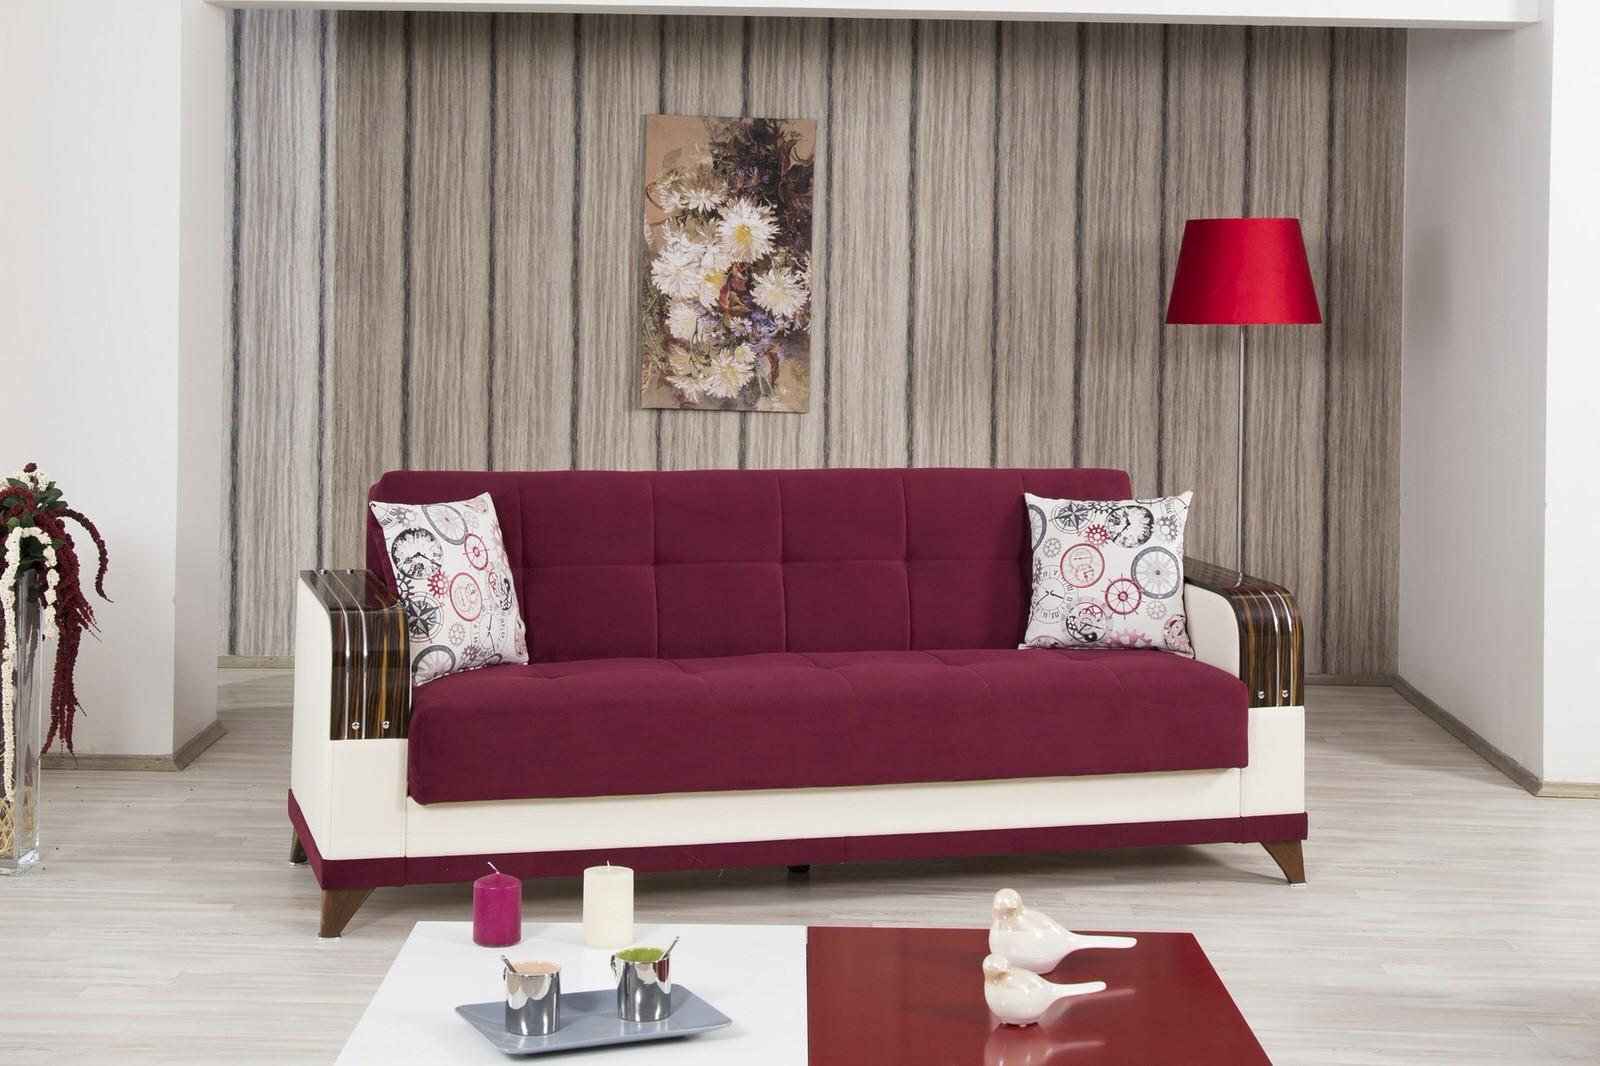 almira golf burgundy convertible sofa bed by casamode